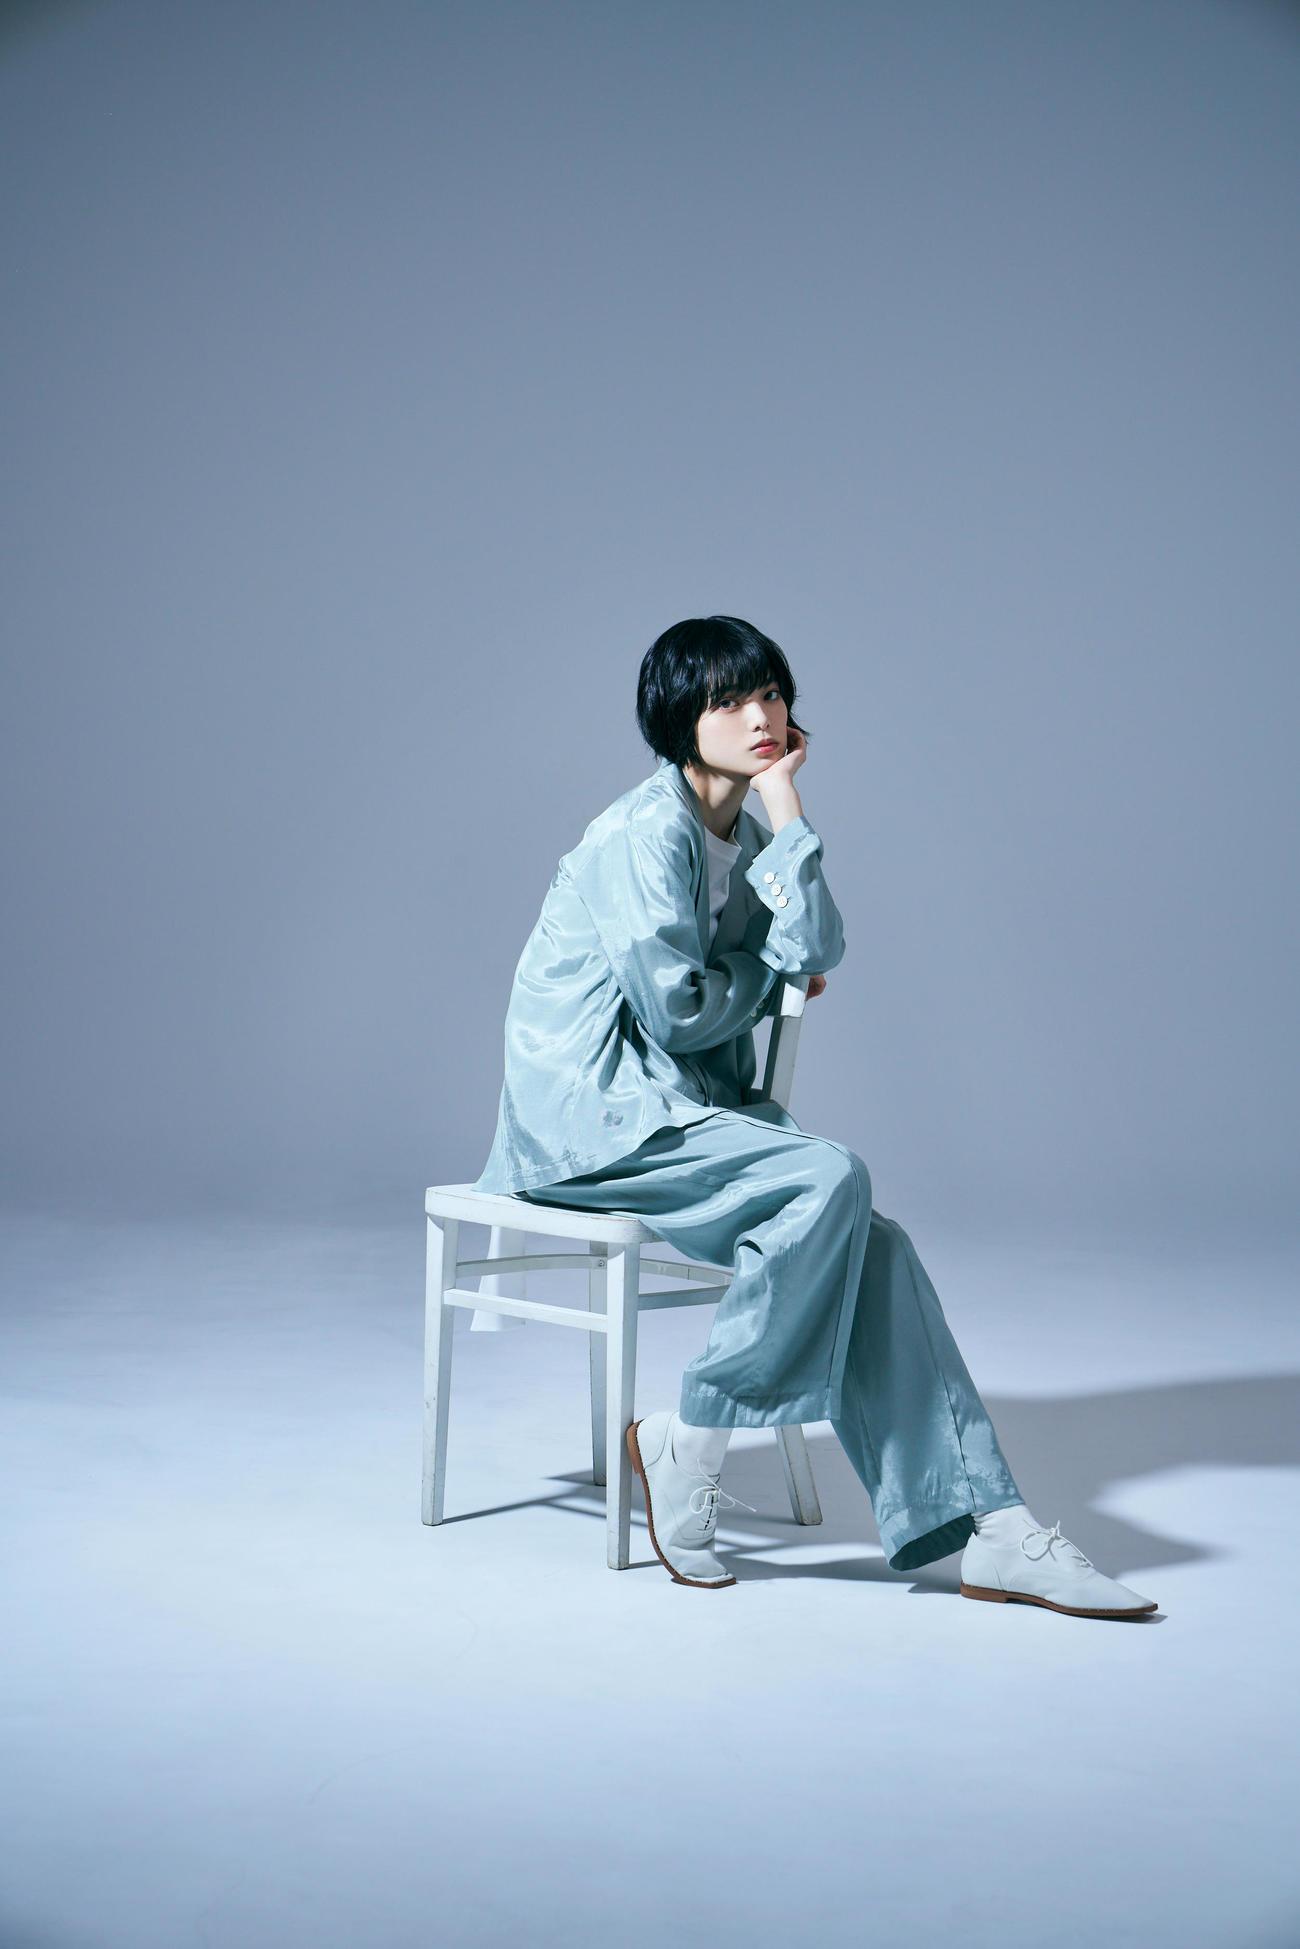 Mrs.GREEN APPLE「WanteD!WanteD!」(Side Story ver.)のミュージックビデオに特別出演する平手友梨奈